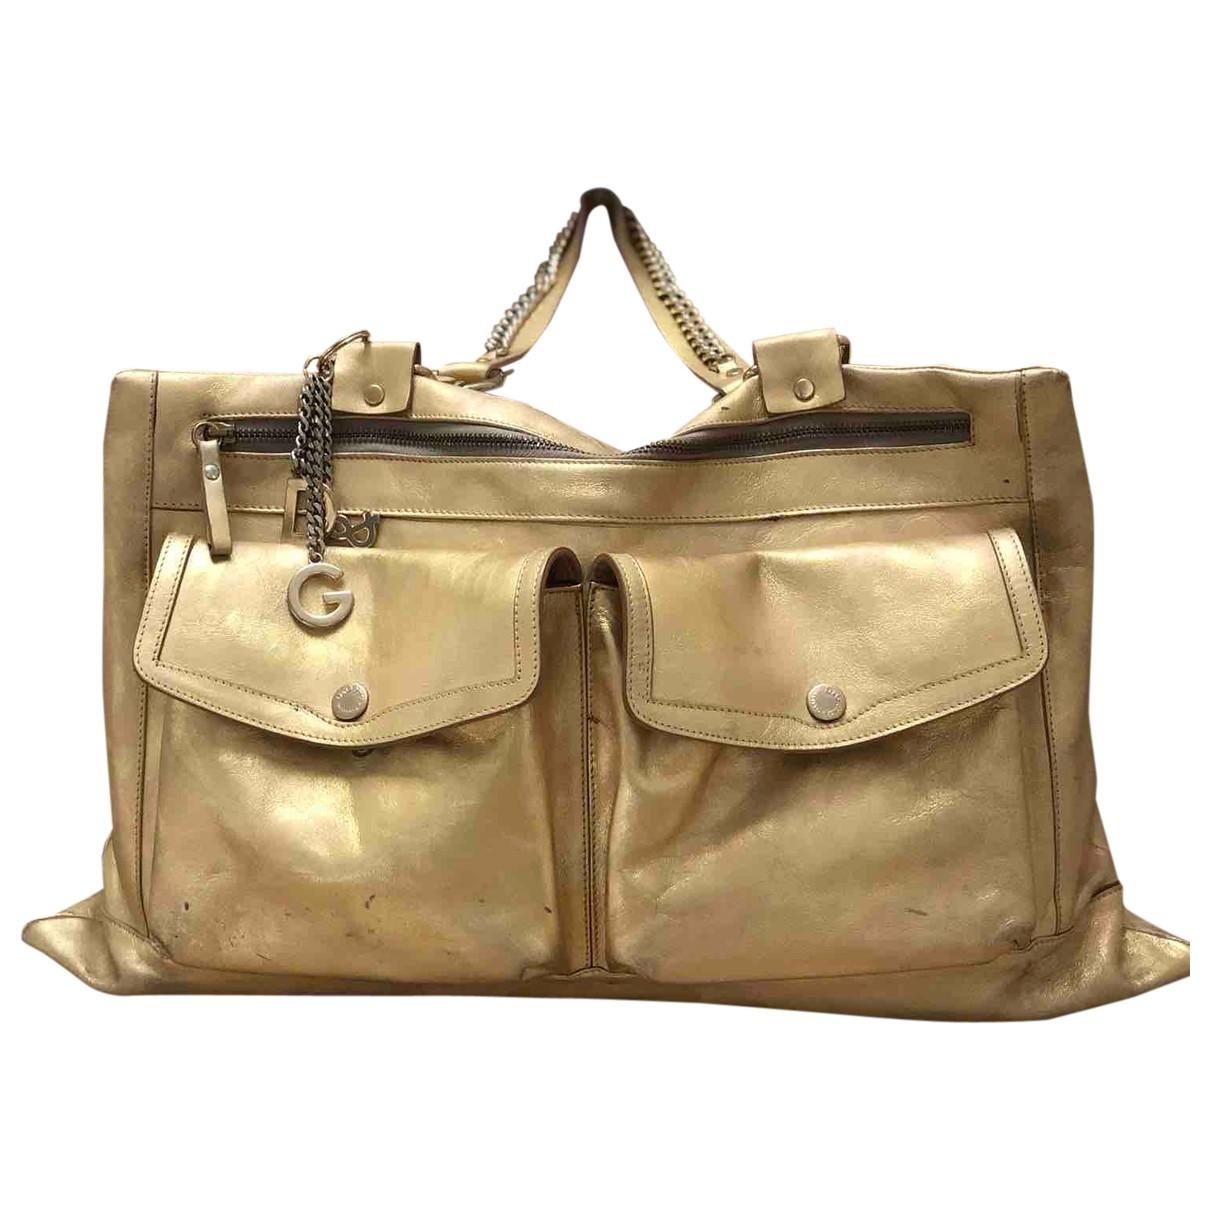 Dolce & Gabbana \N Gold Leather handbag for Women \N